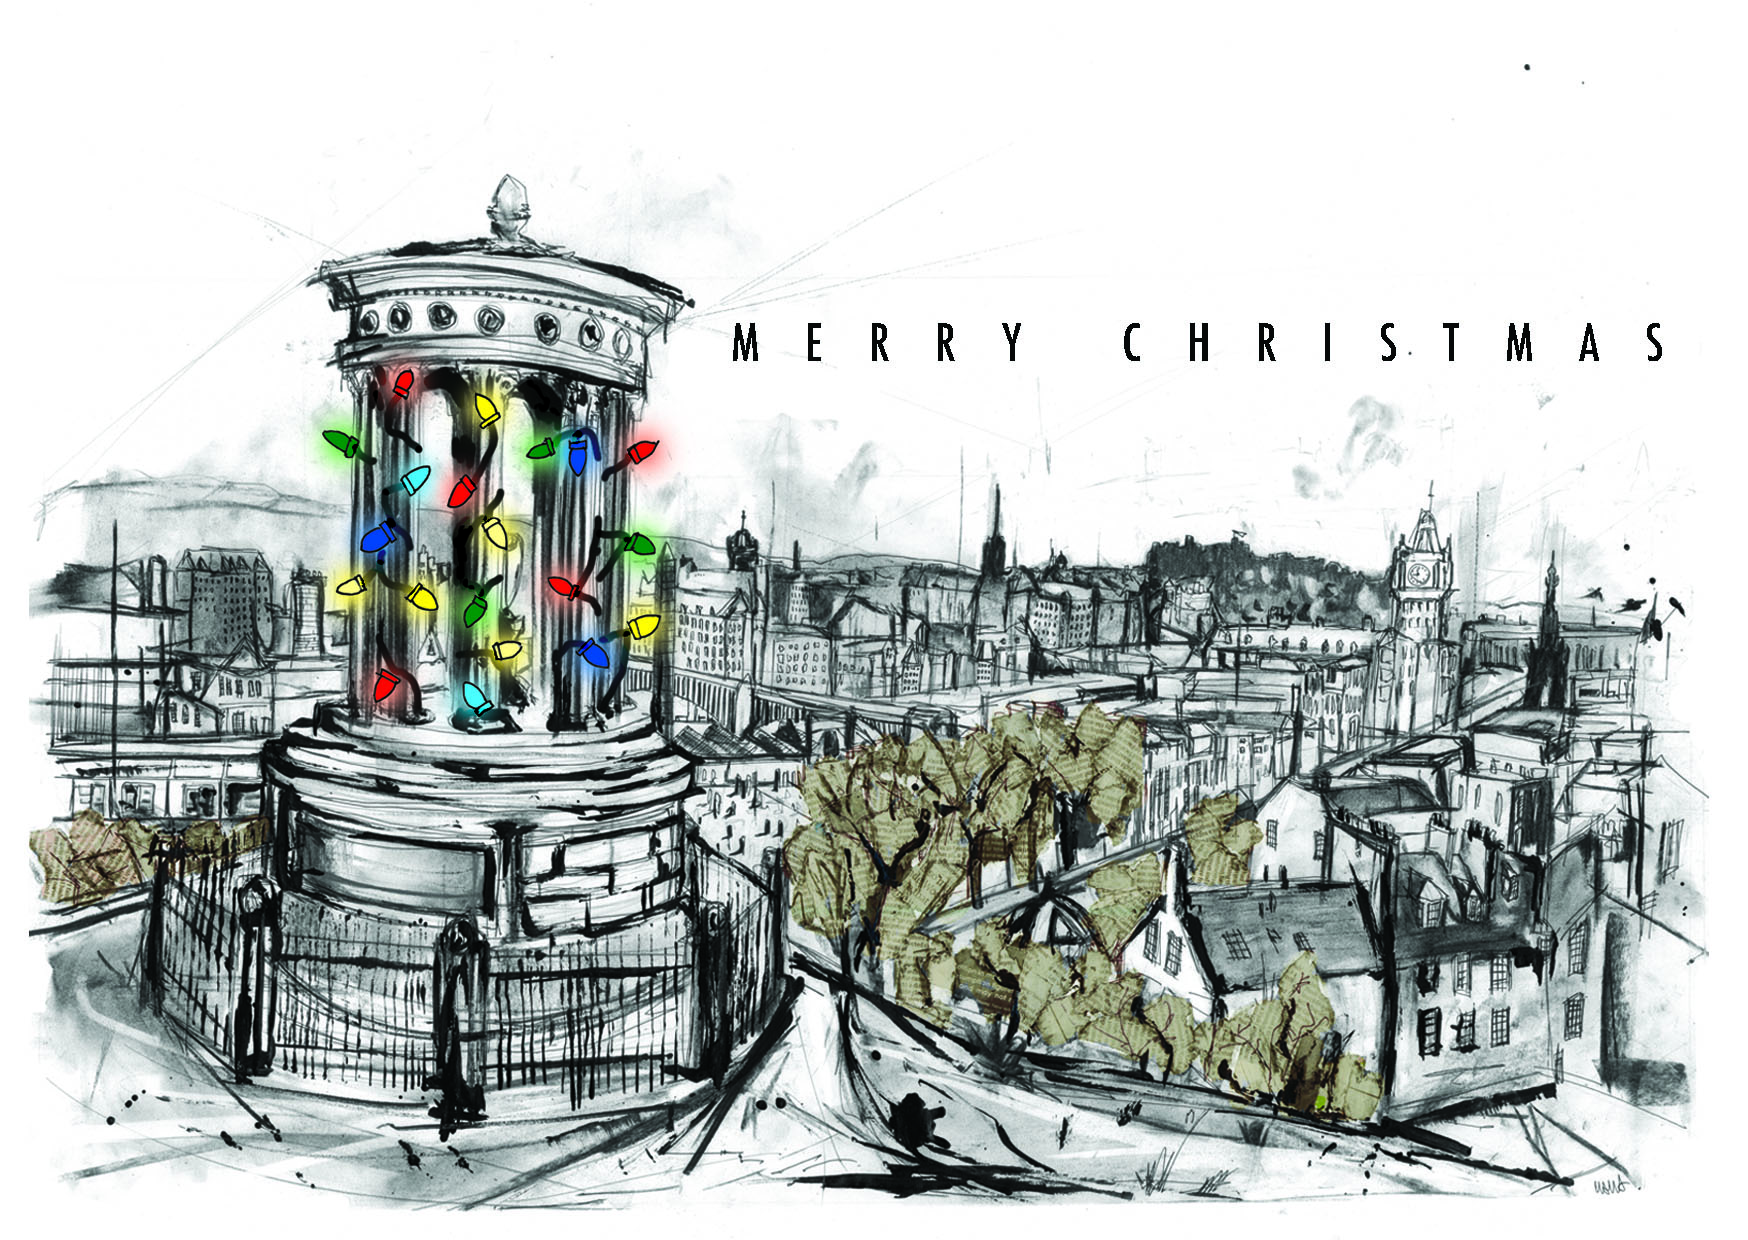 Calton Hill Christmas Card